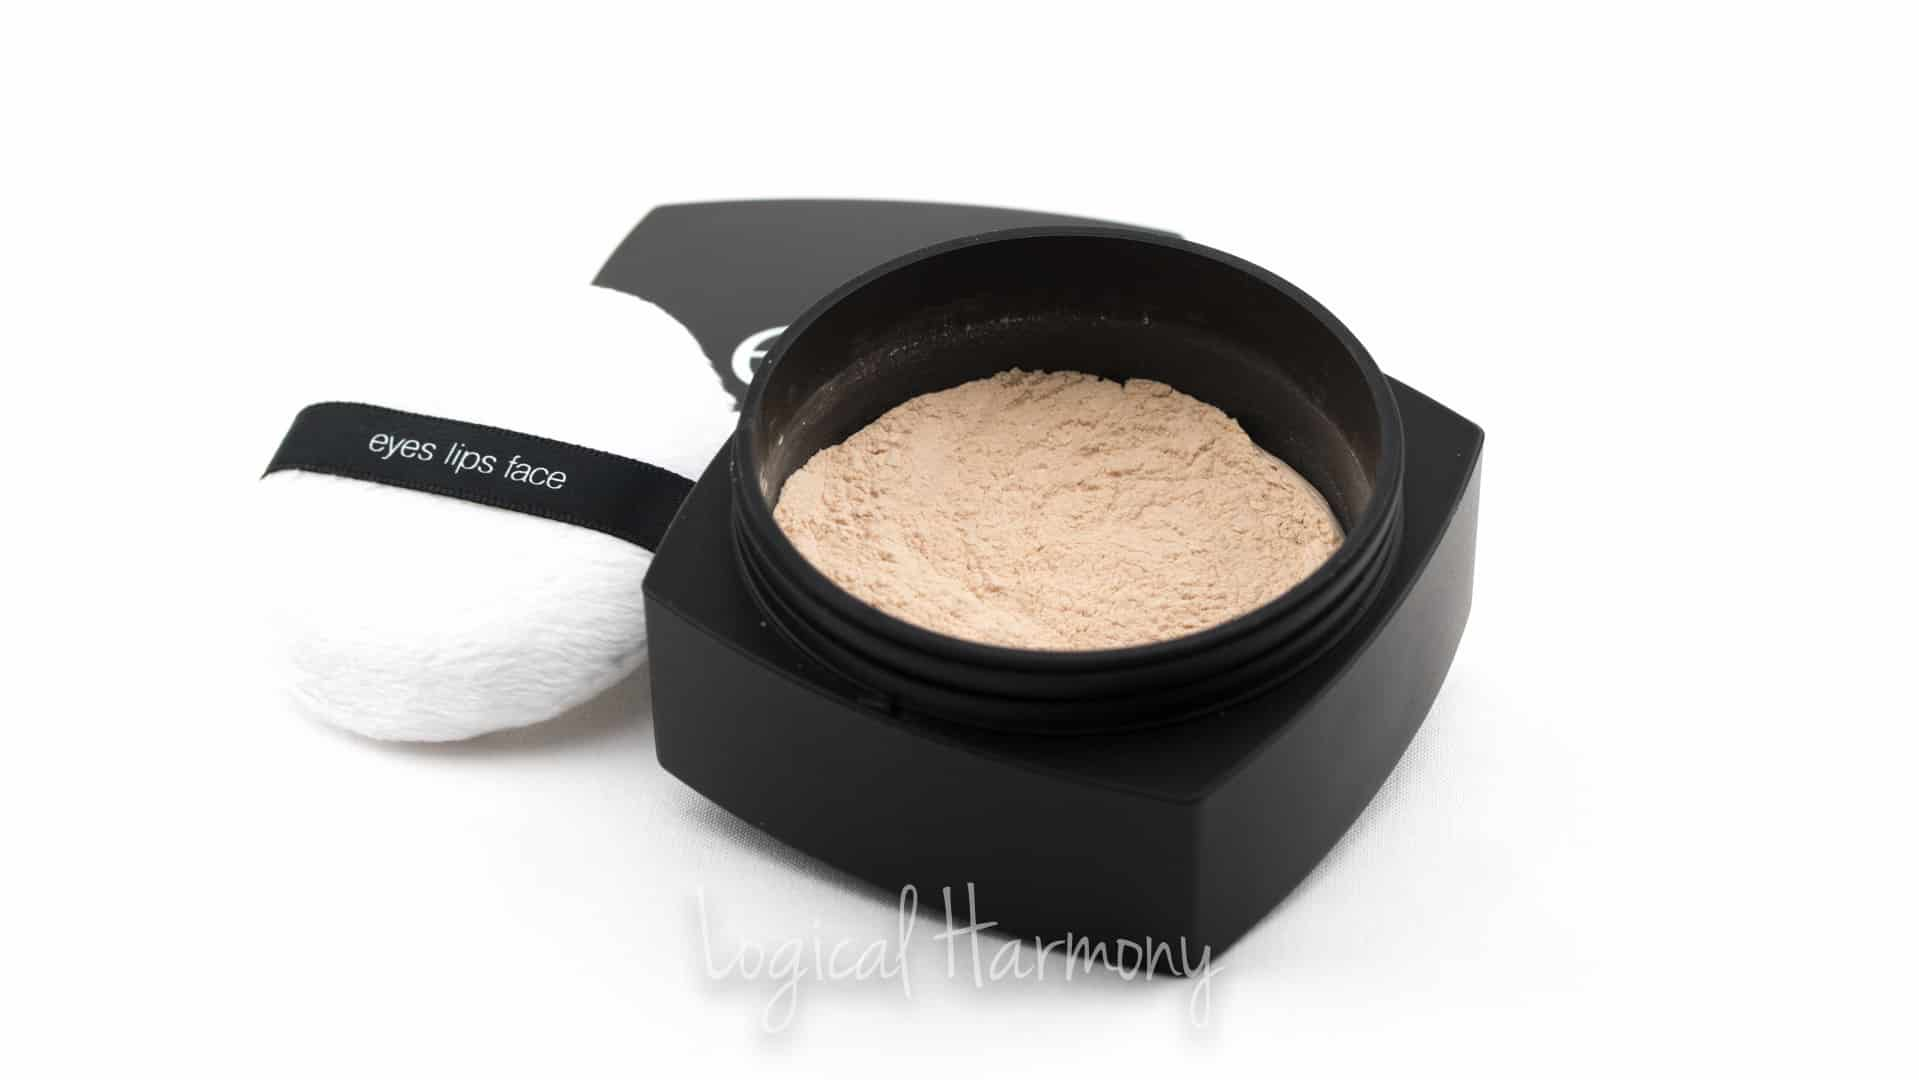 elf High Definition Powder in Soft Luminance Review